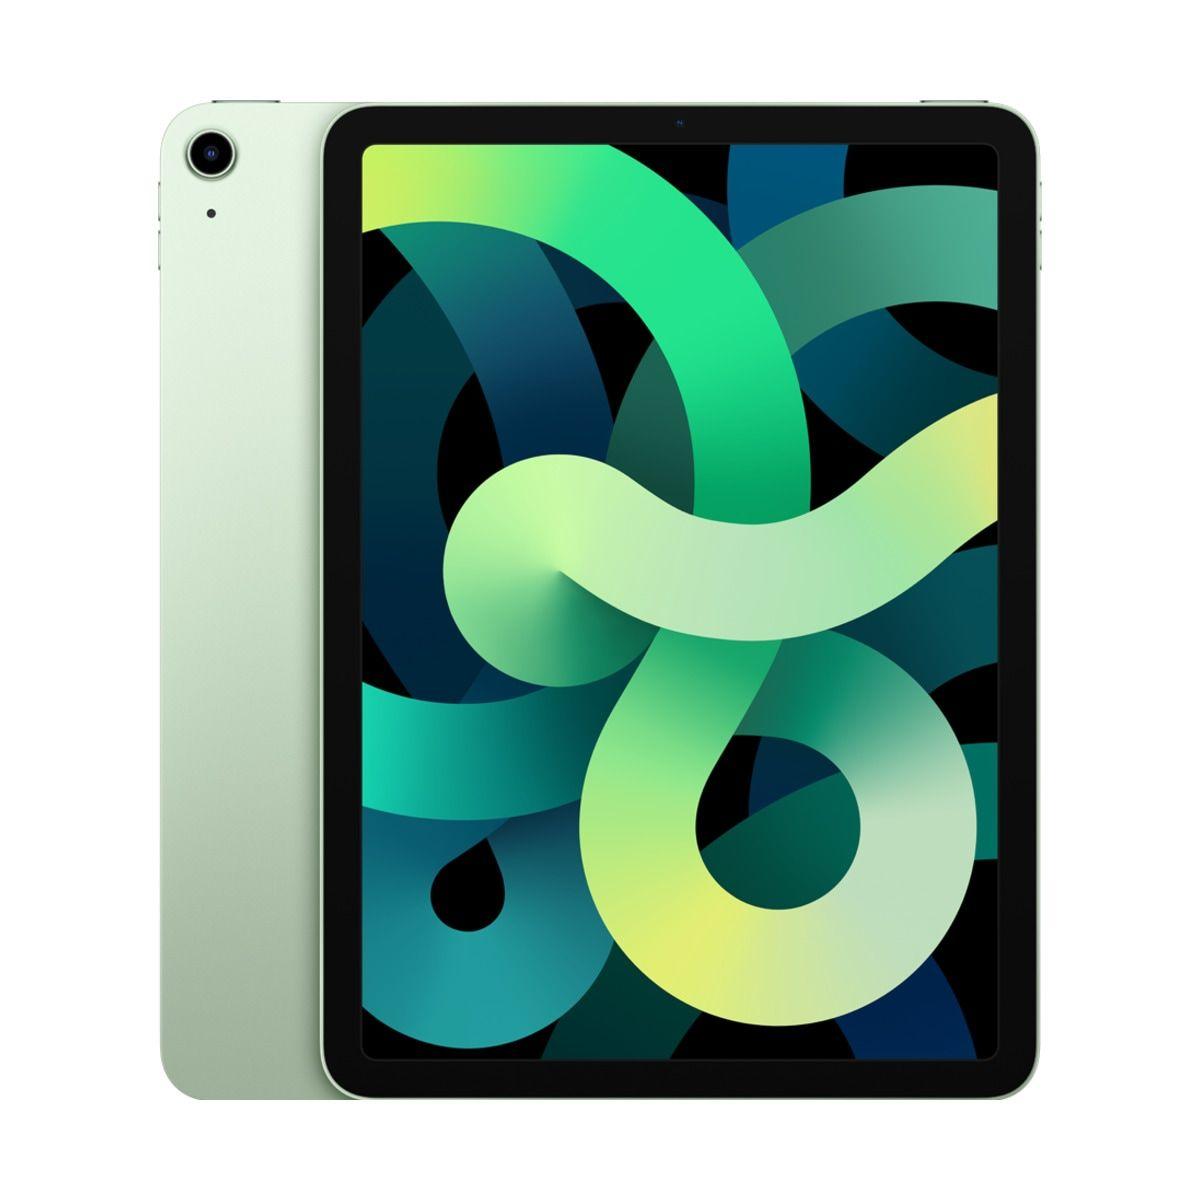 Apple iPad Air Wi-Fi 64GB - Green / SK